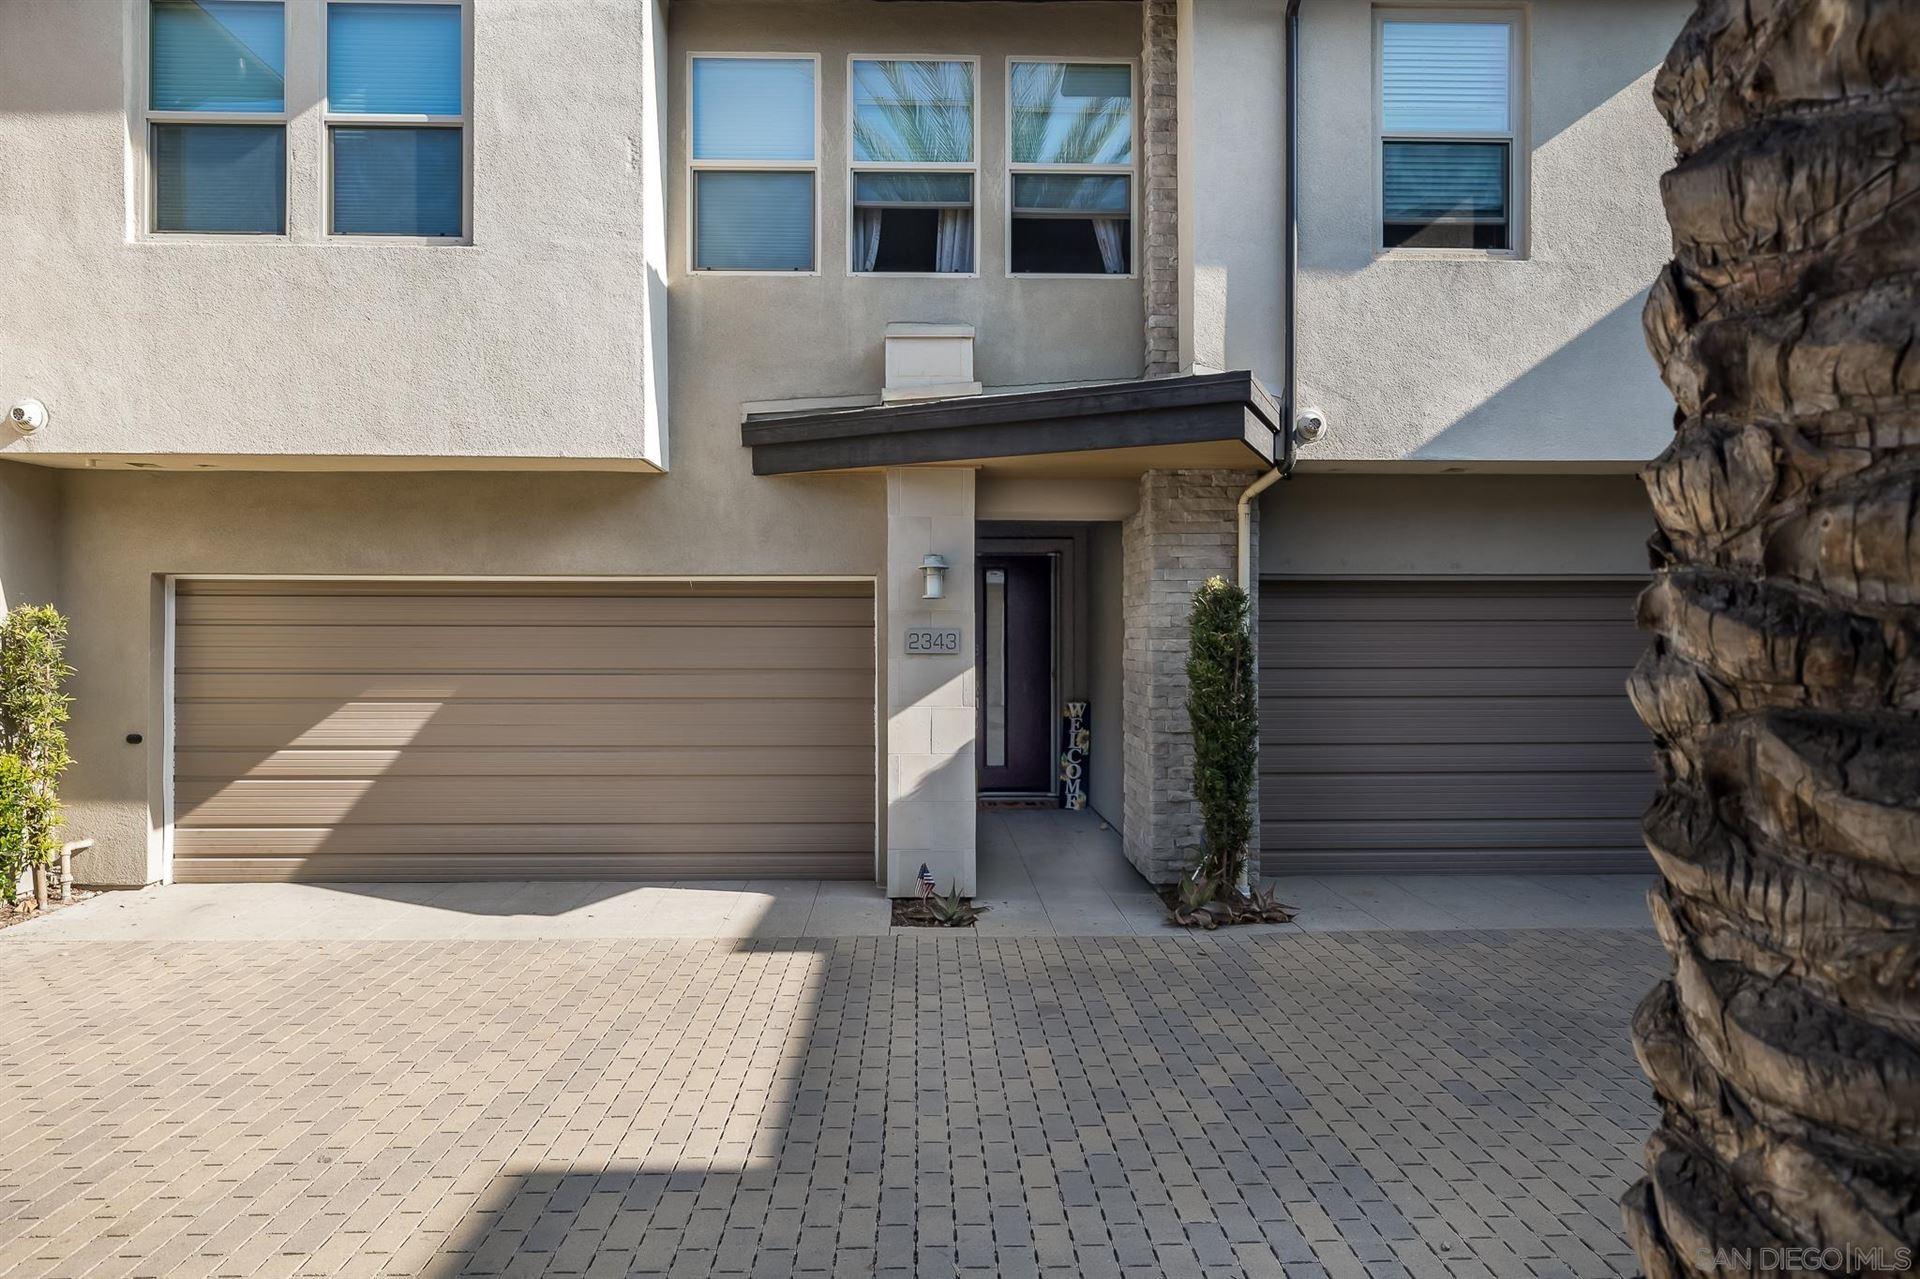 Photo of 2343 Aperture Cir, San Diego, CA 92108 (MLS # 210026494)